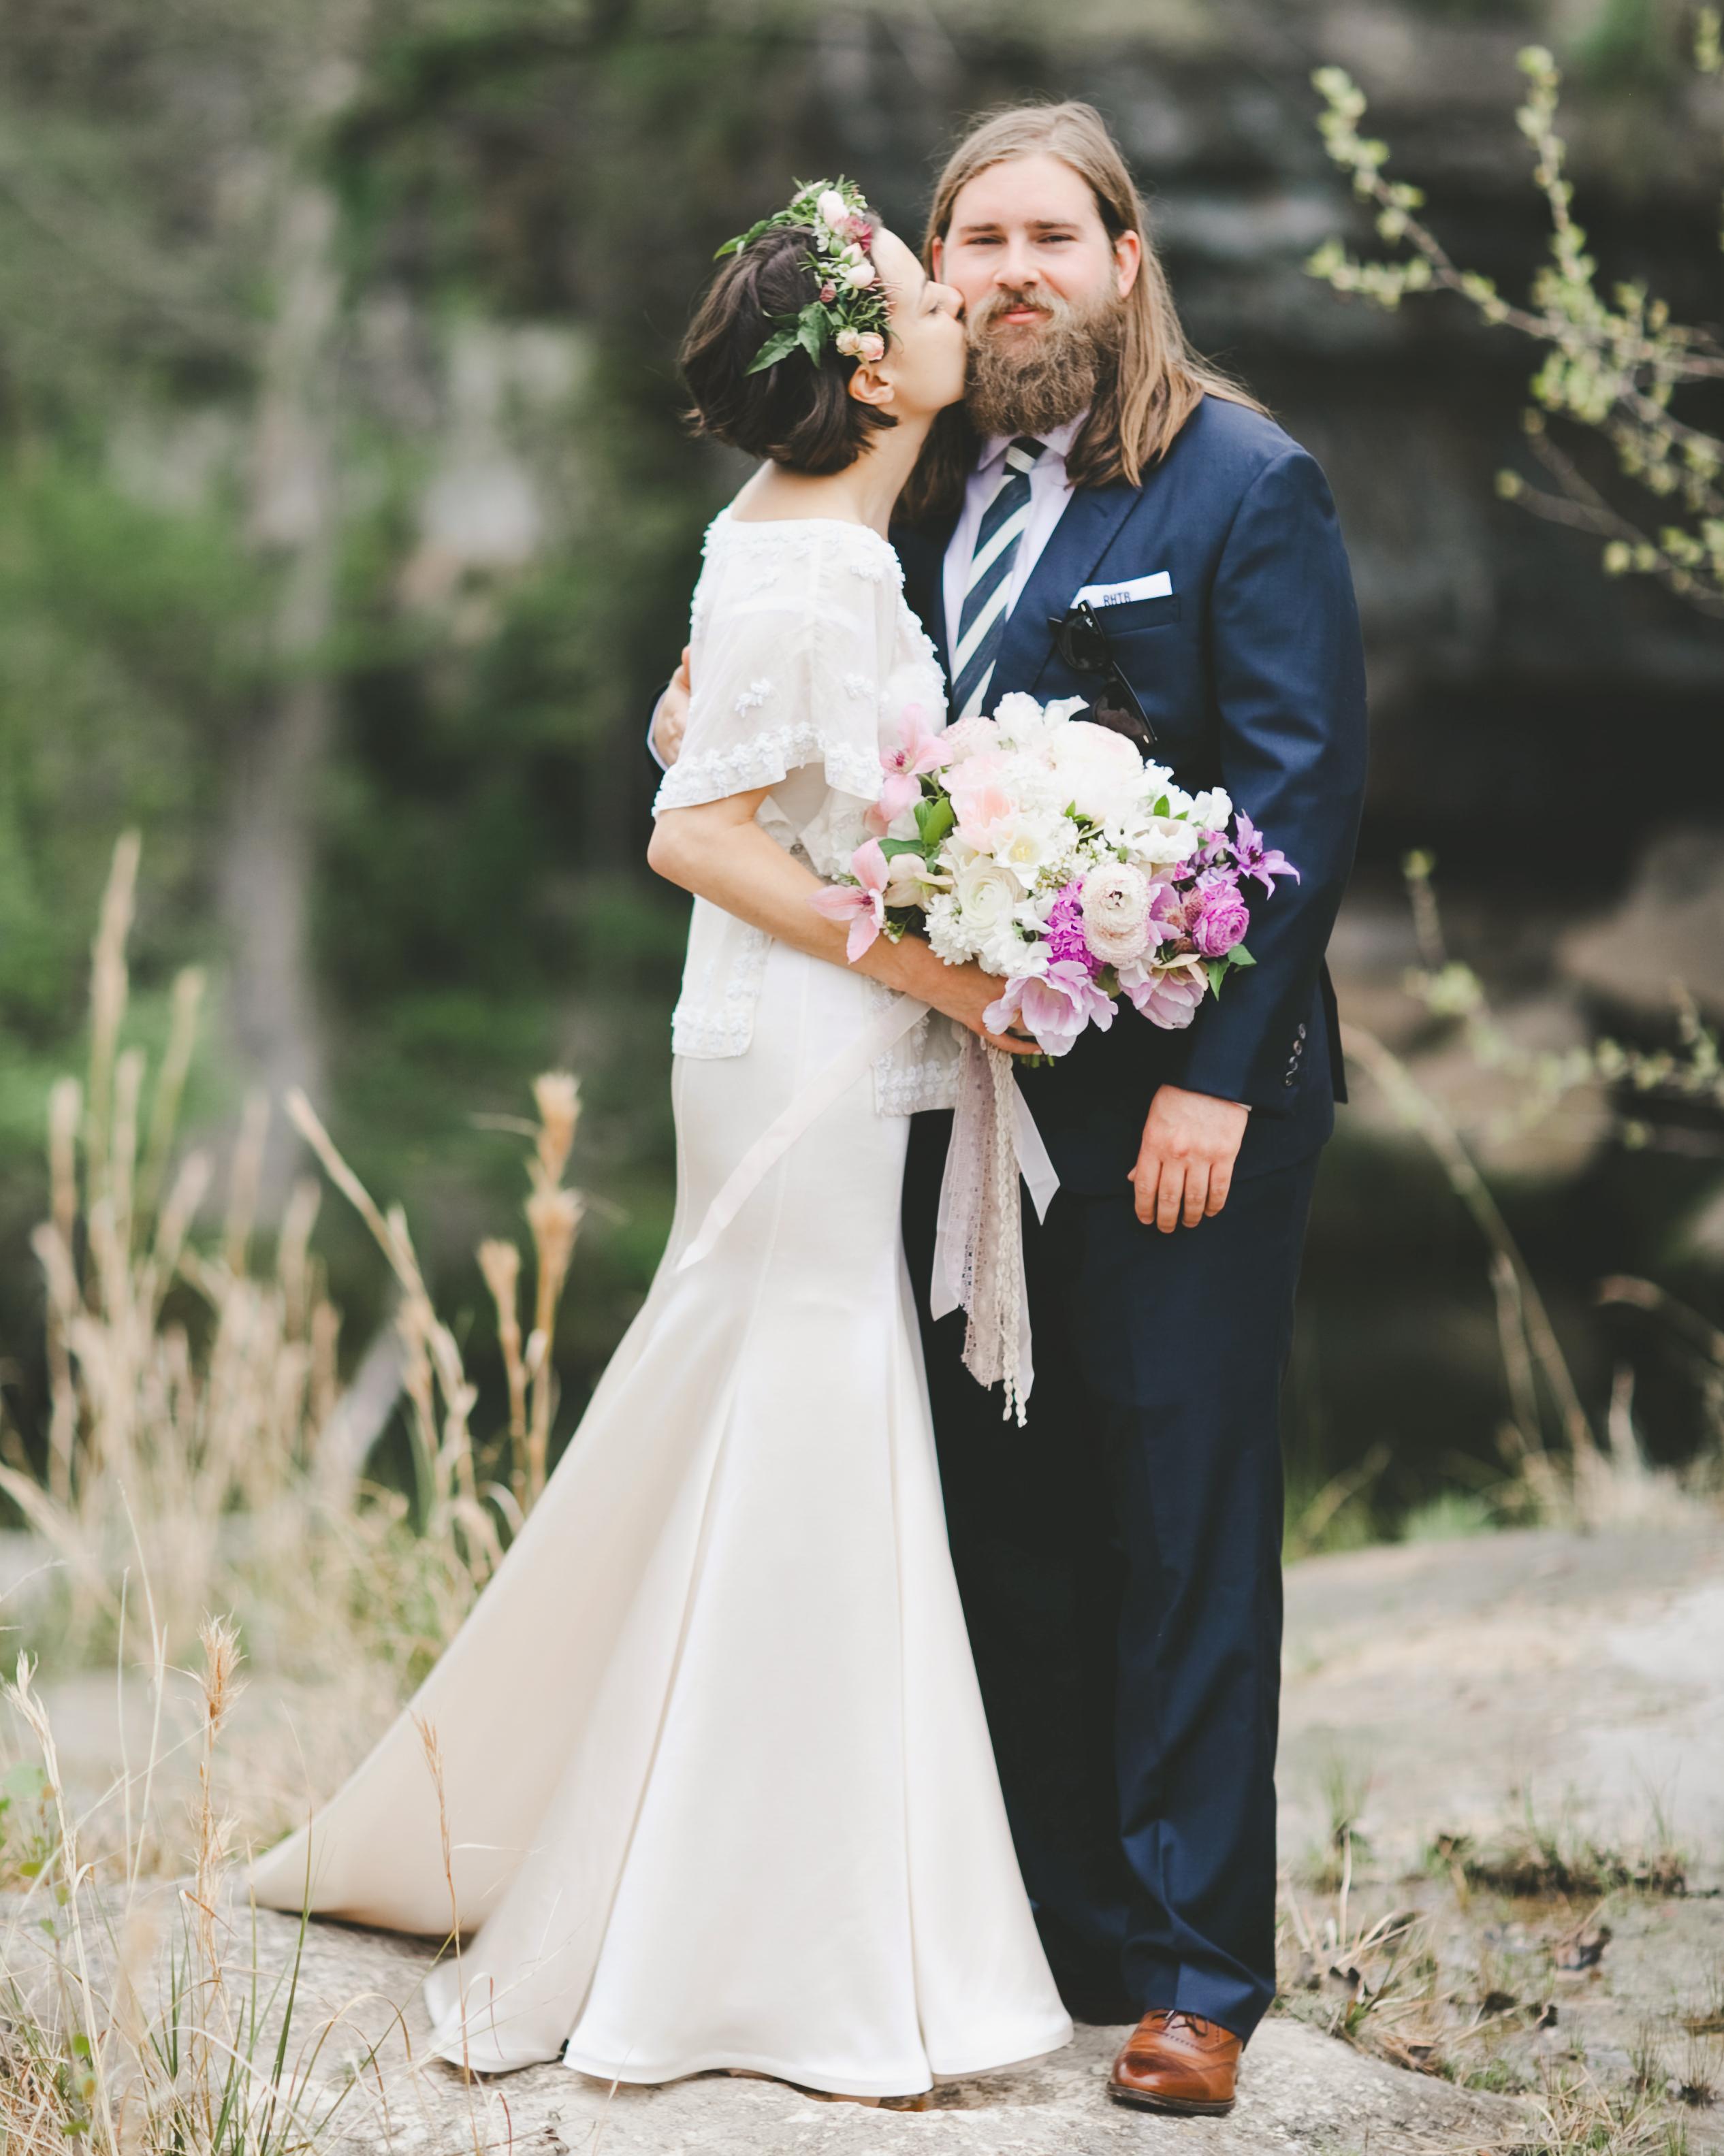 heather-tibaut-wedding-kiss-0314.jpg